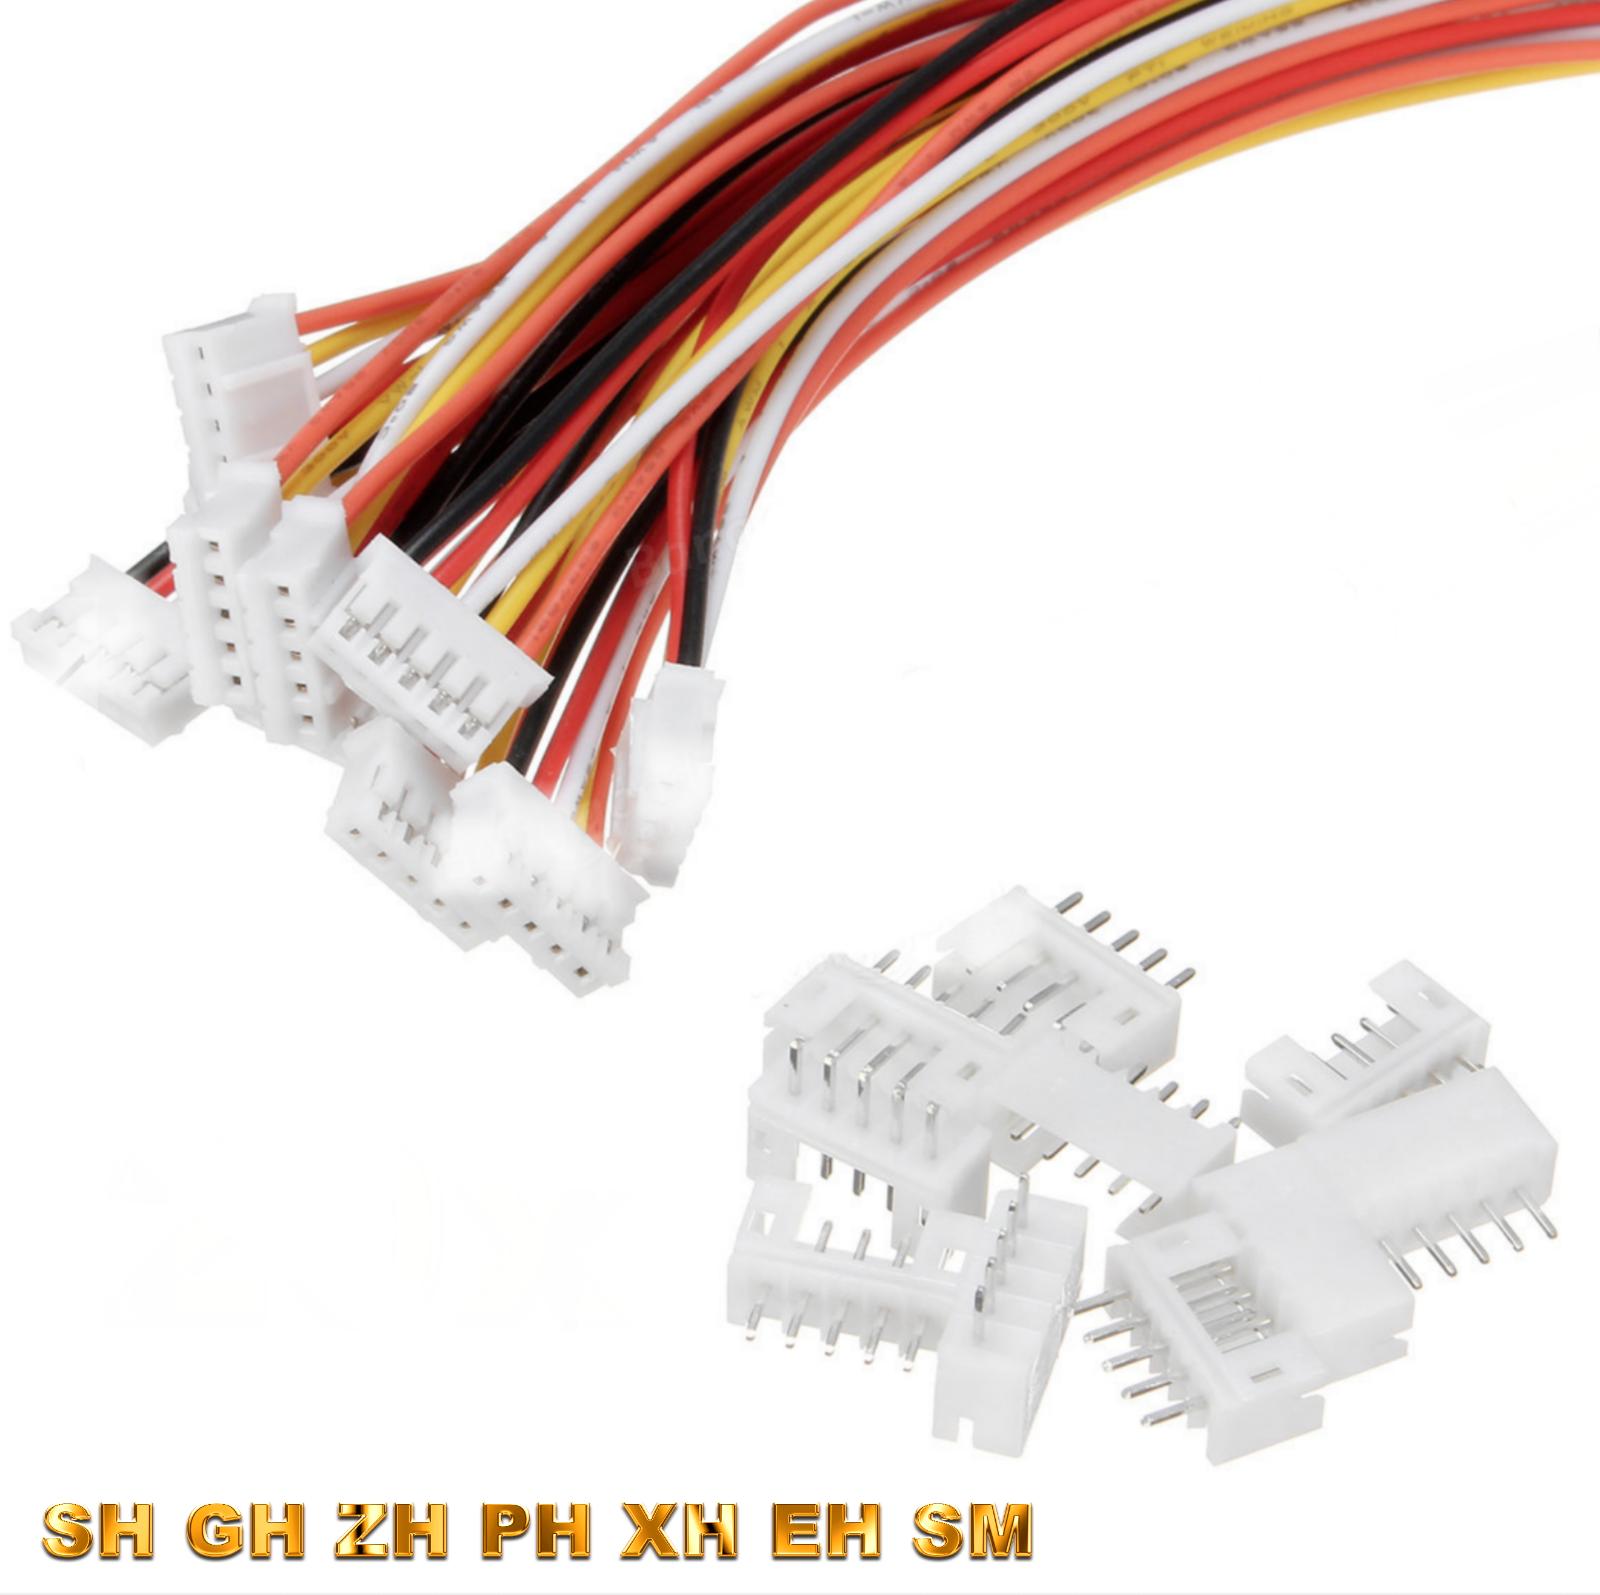 Buchse JST-XH 5 Set 2Pin Mini JST XH 2.5mm 2.5 Stecker 15cm Kabel 10 Stück